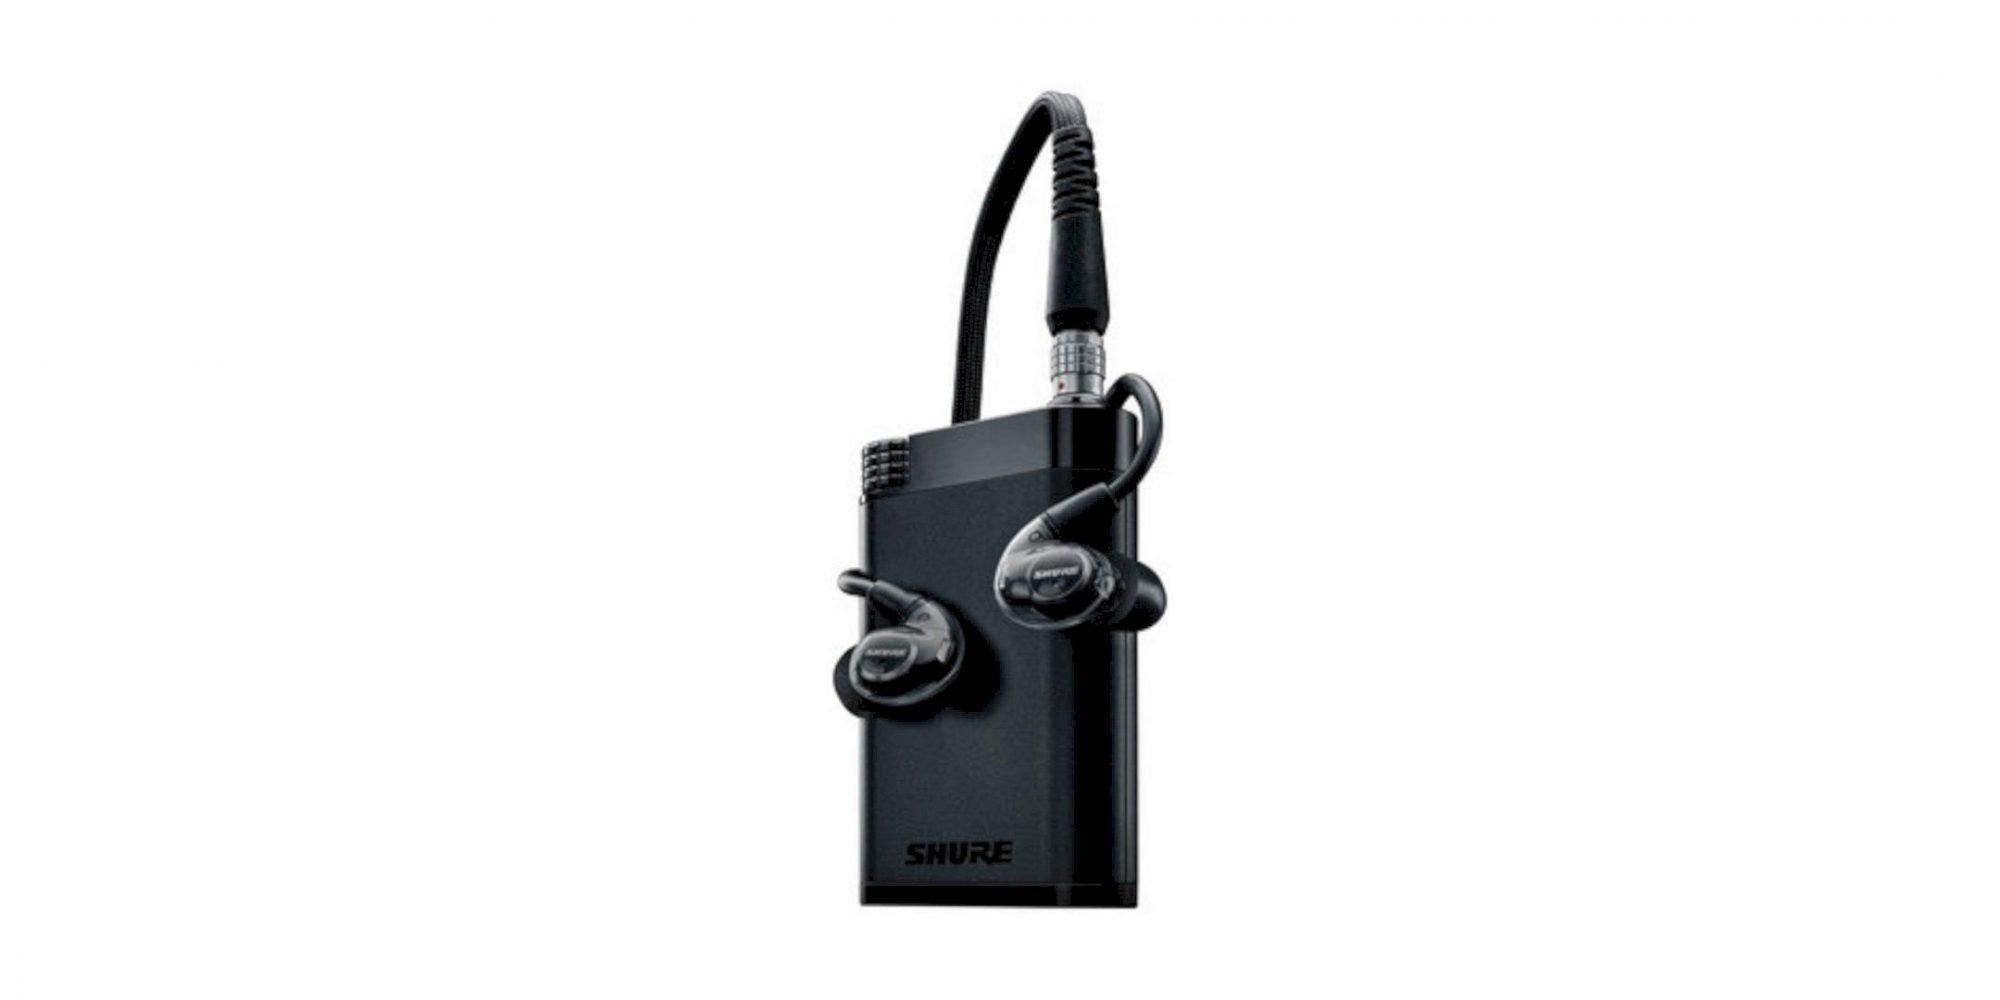 KSE1200 Electrostatic Earphone System: A Premium Earphone for Better Audio